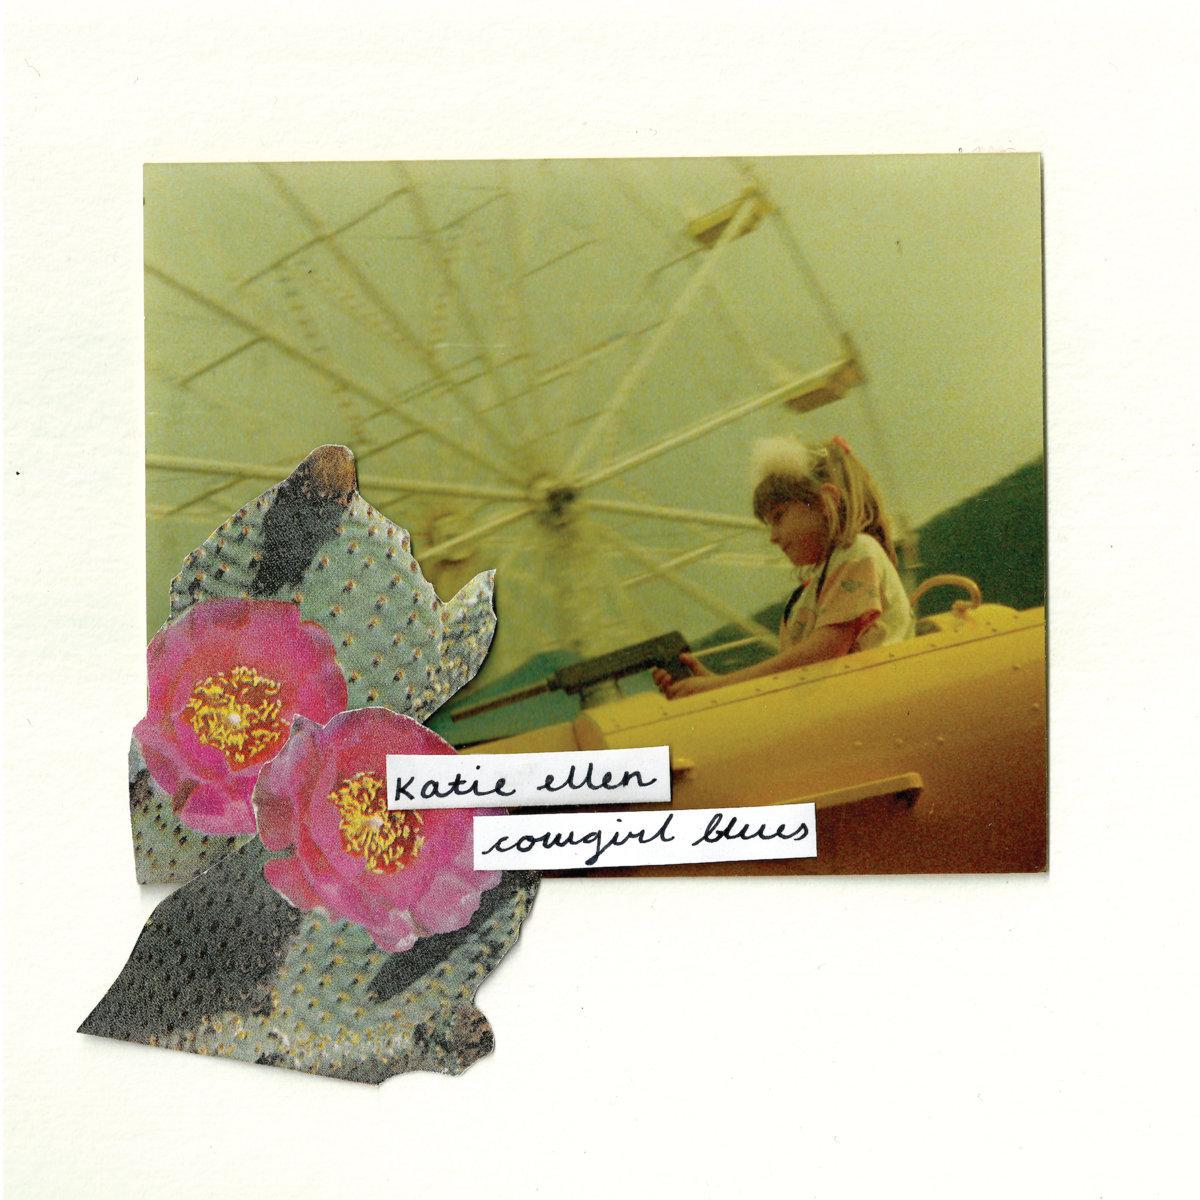 Katie Ellen / Cowgirl Blues(100 Ltd LP)